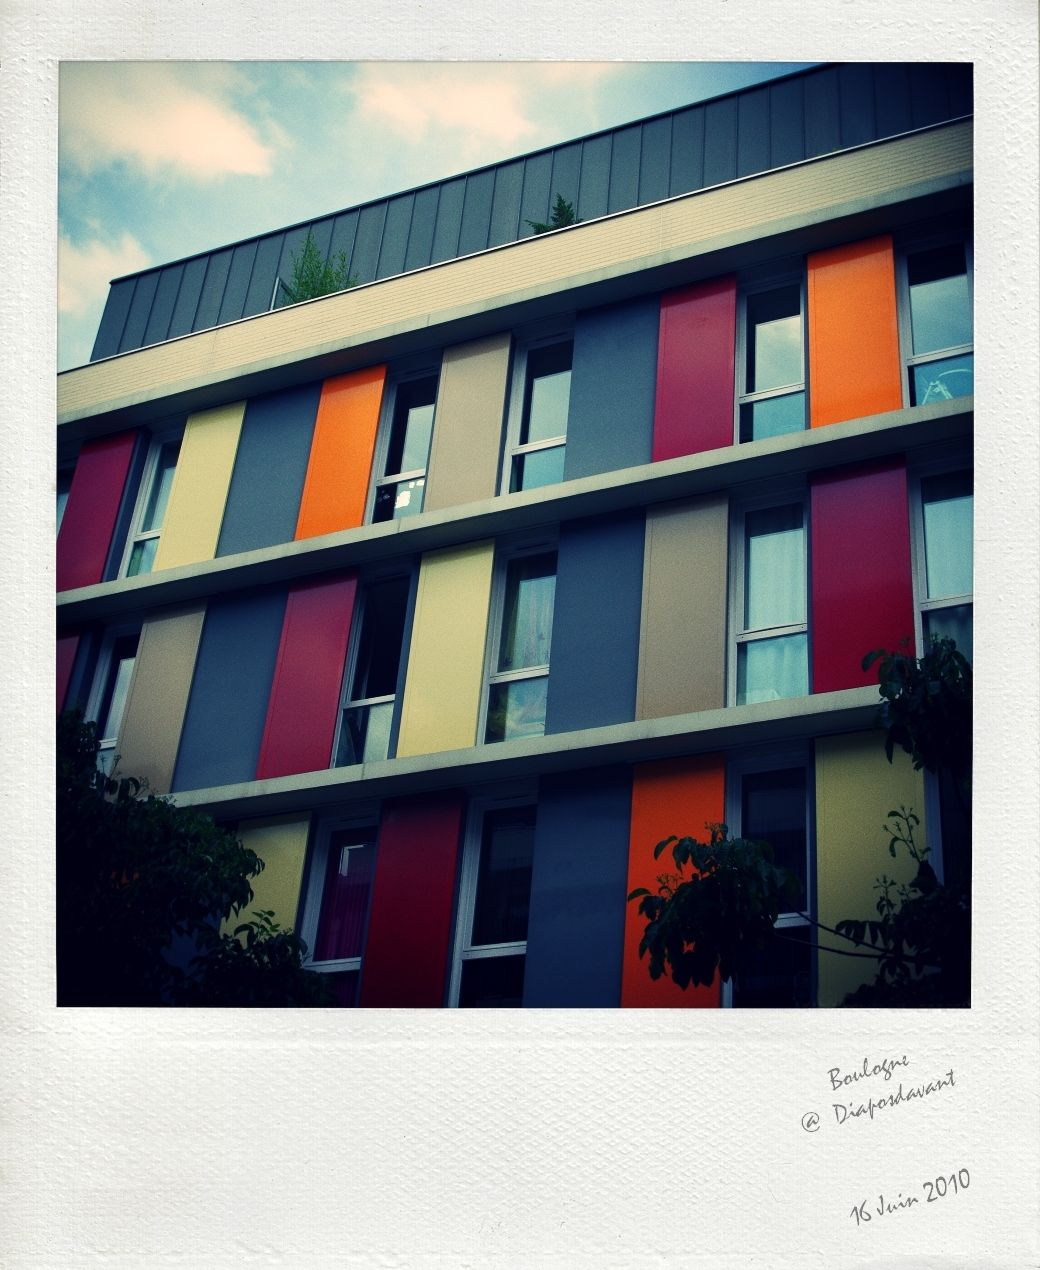 Boulogne 2010